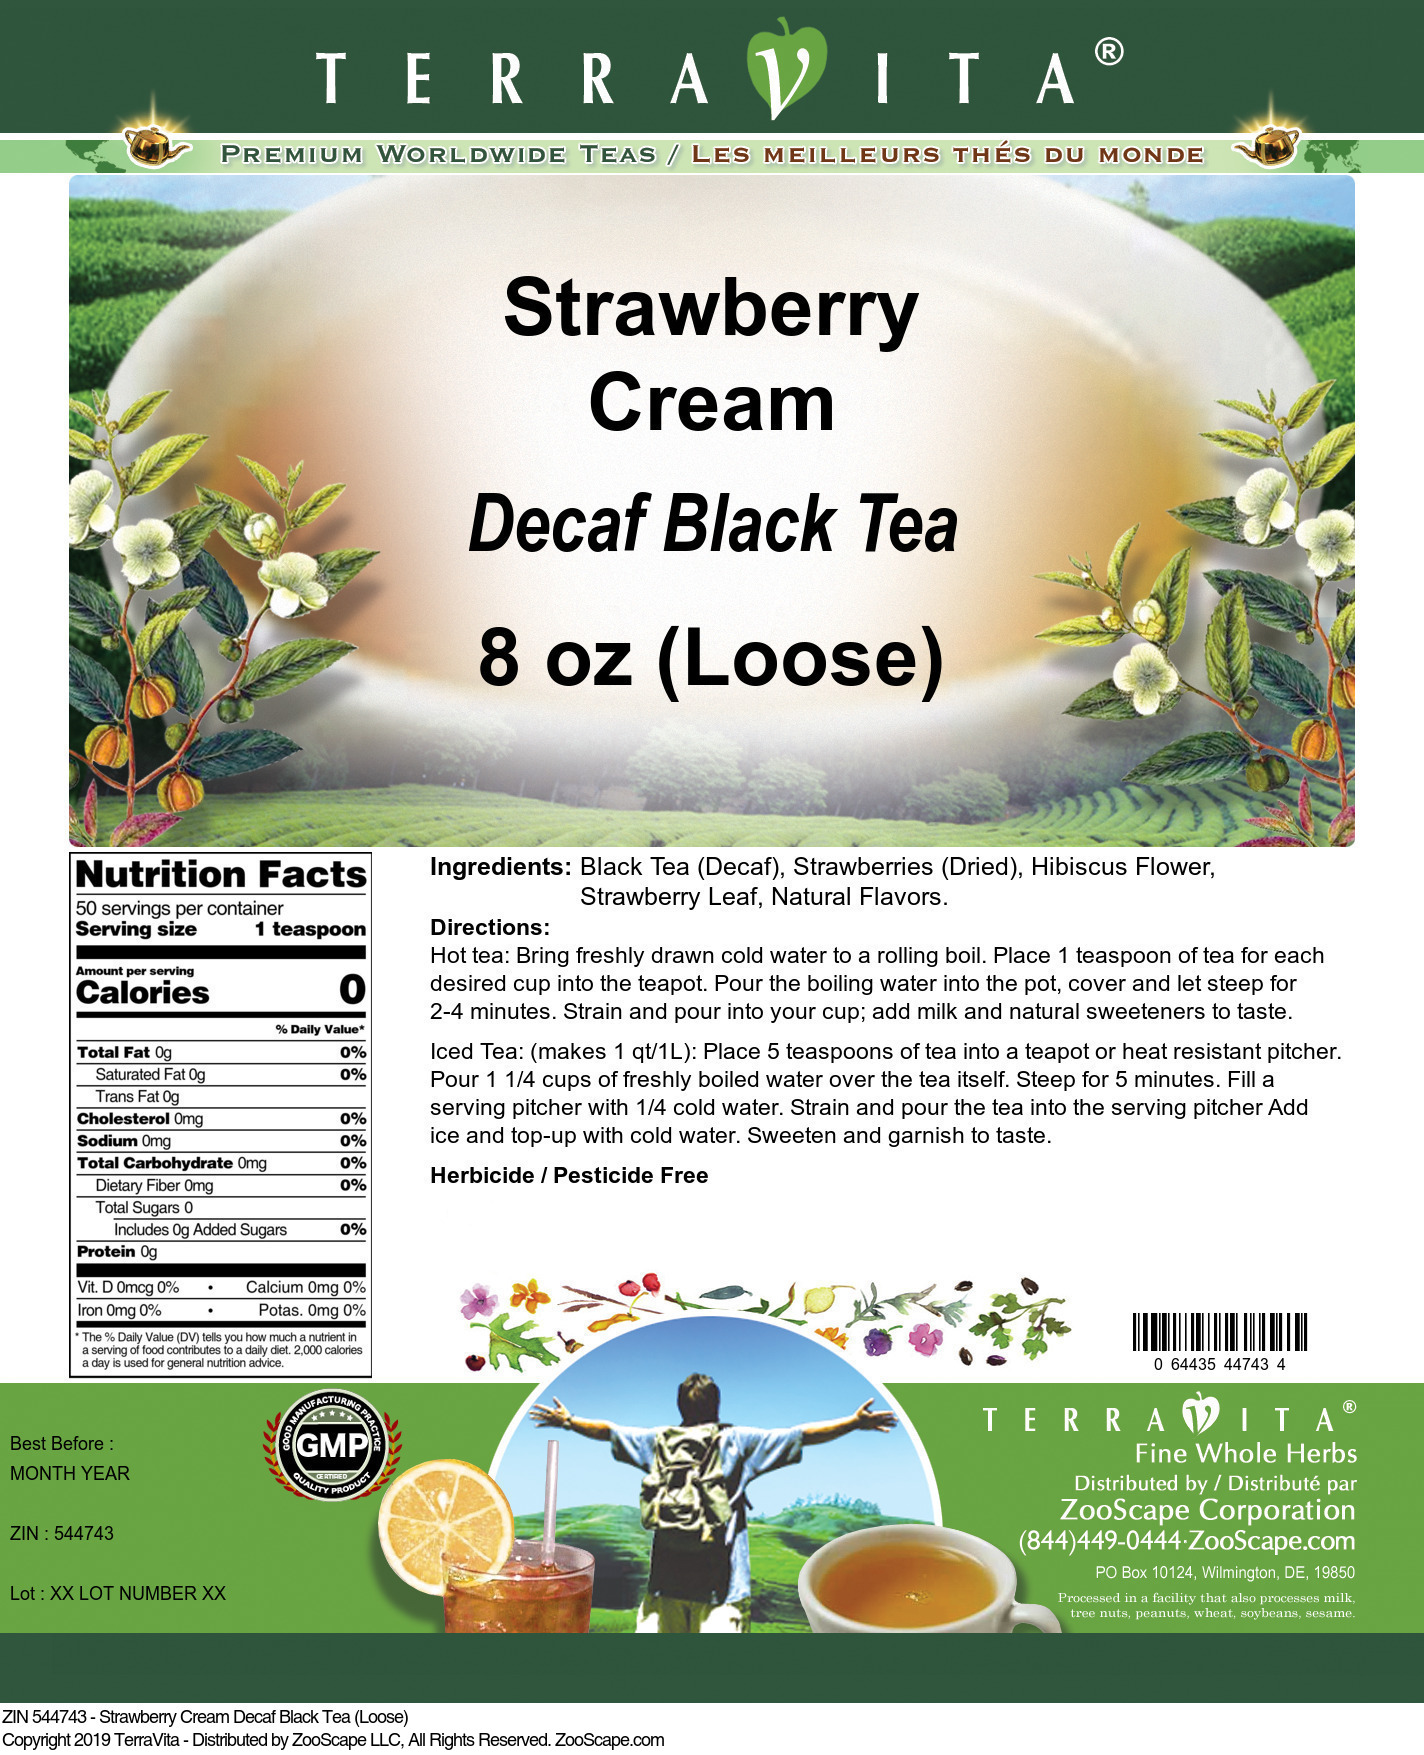 Strawberry Cream Decaf Black Tea (Loose)